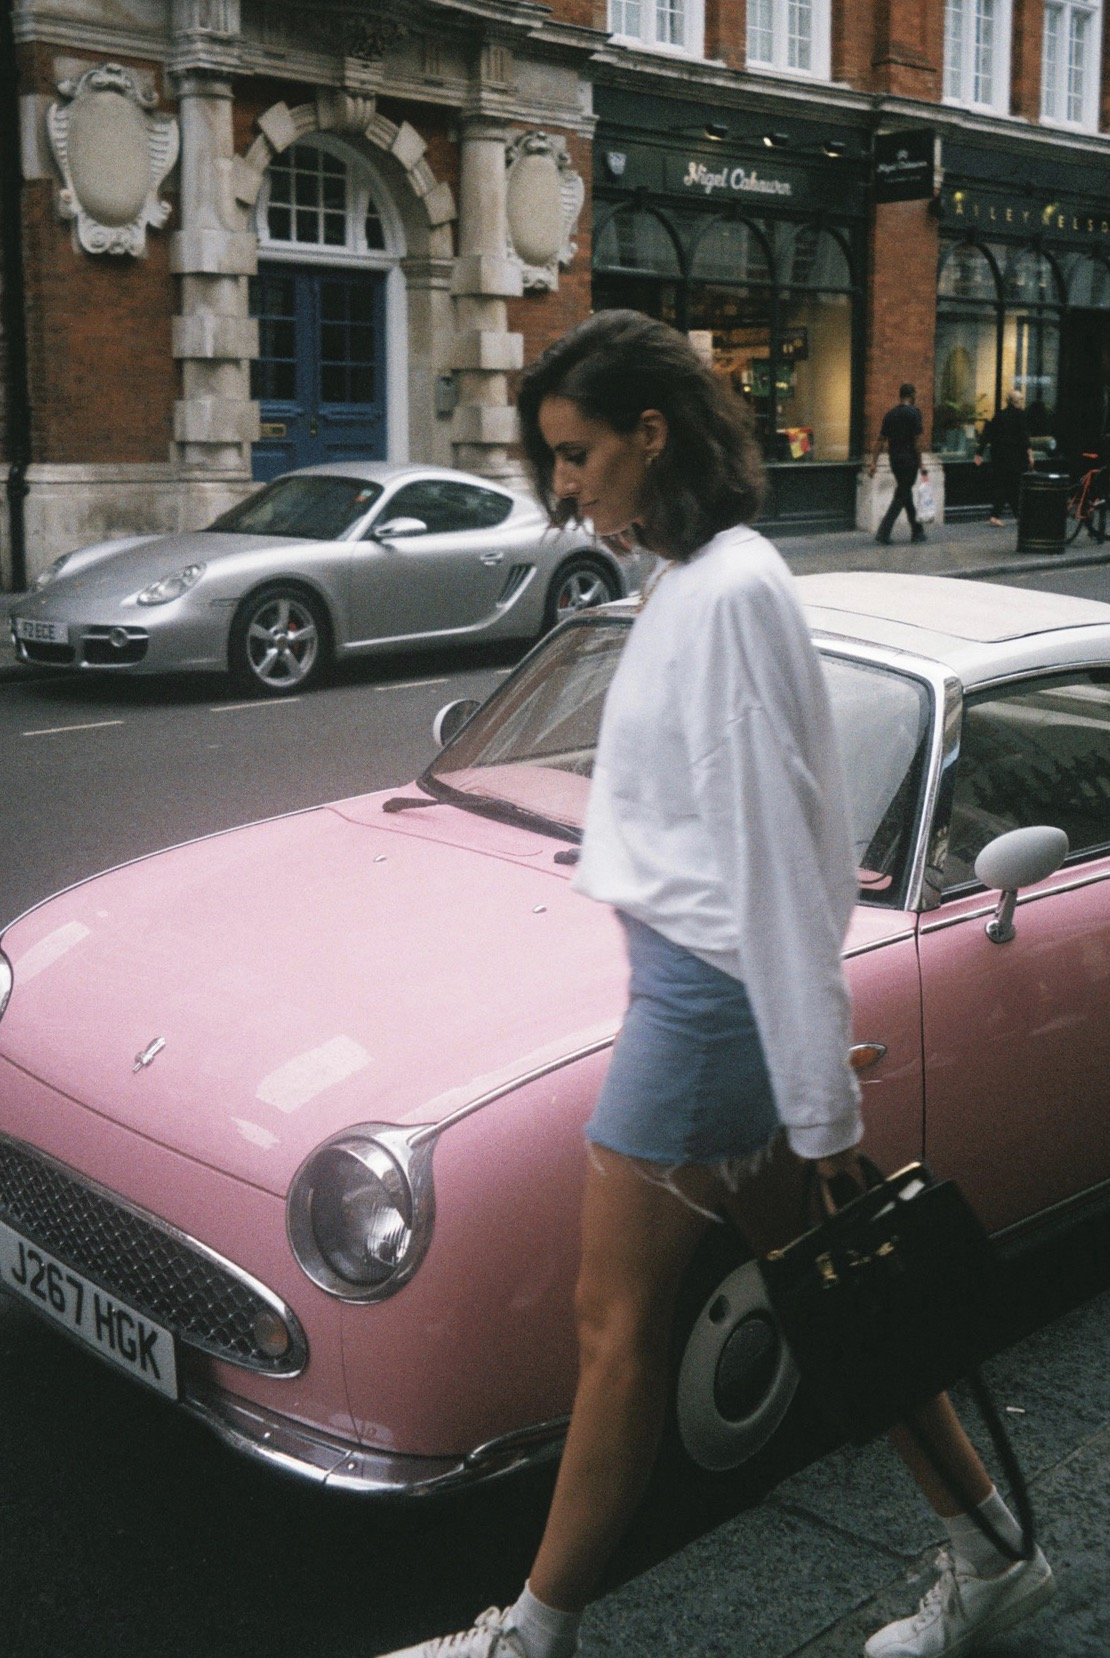 Wearing my favourite    jumper    and the shortest mini skirt ever.  / A usar a minha  sweater  favorita e a mini skirt mais curta de todo o sempre.